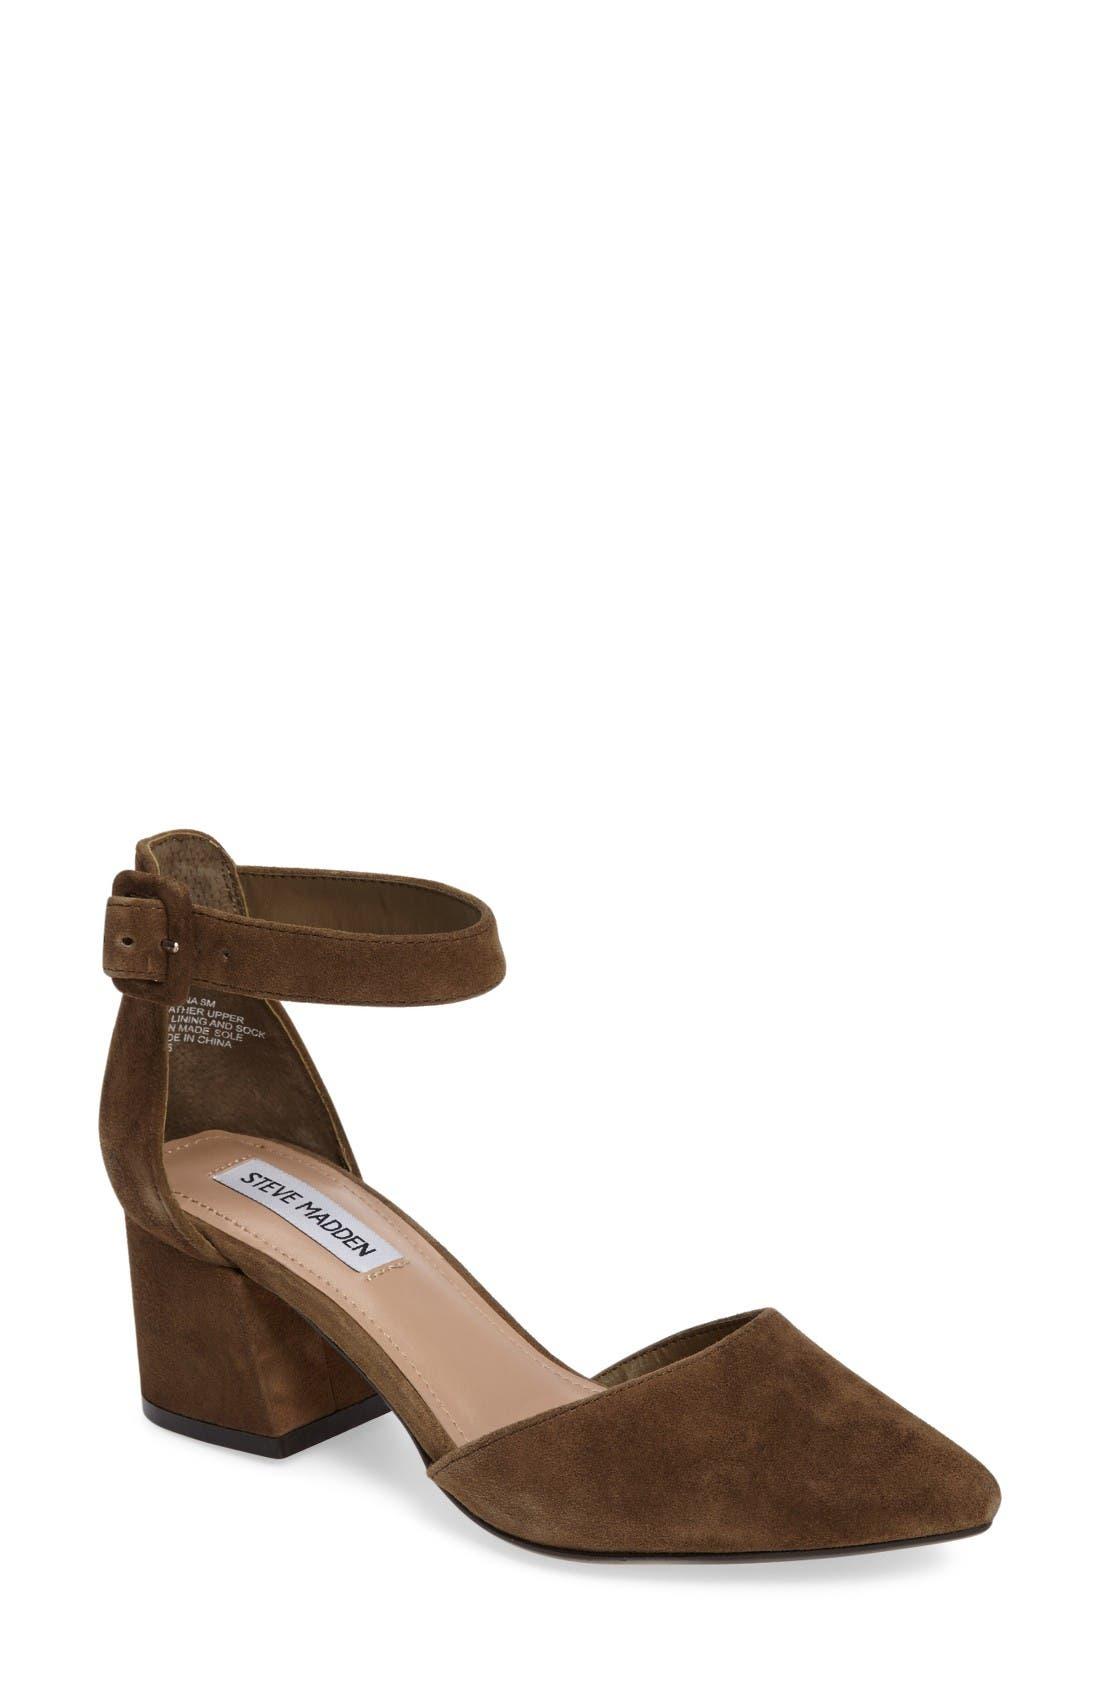 Steve Madden Dainna d'Orsay Ankle Strap Pump (Women)